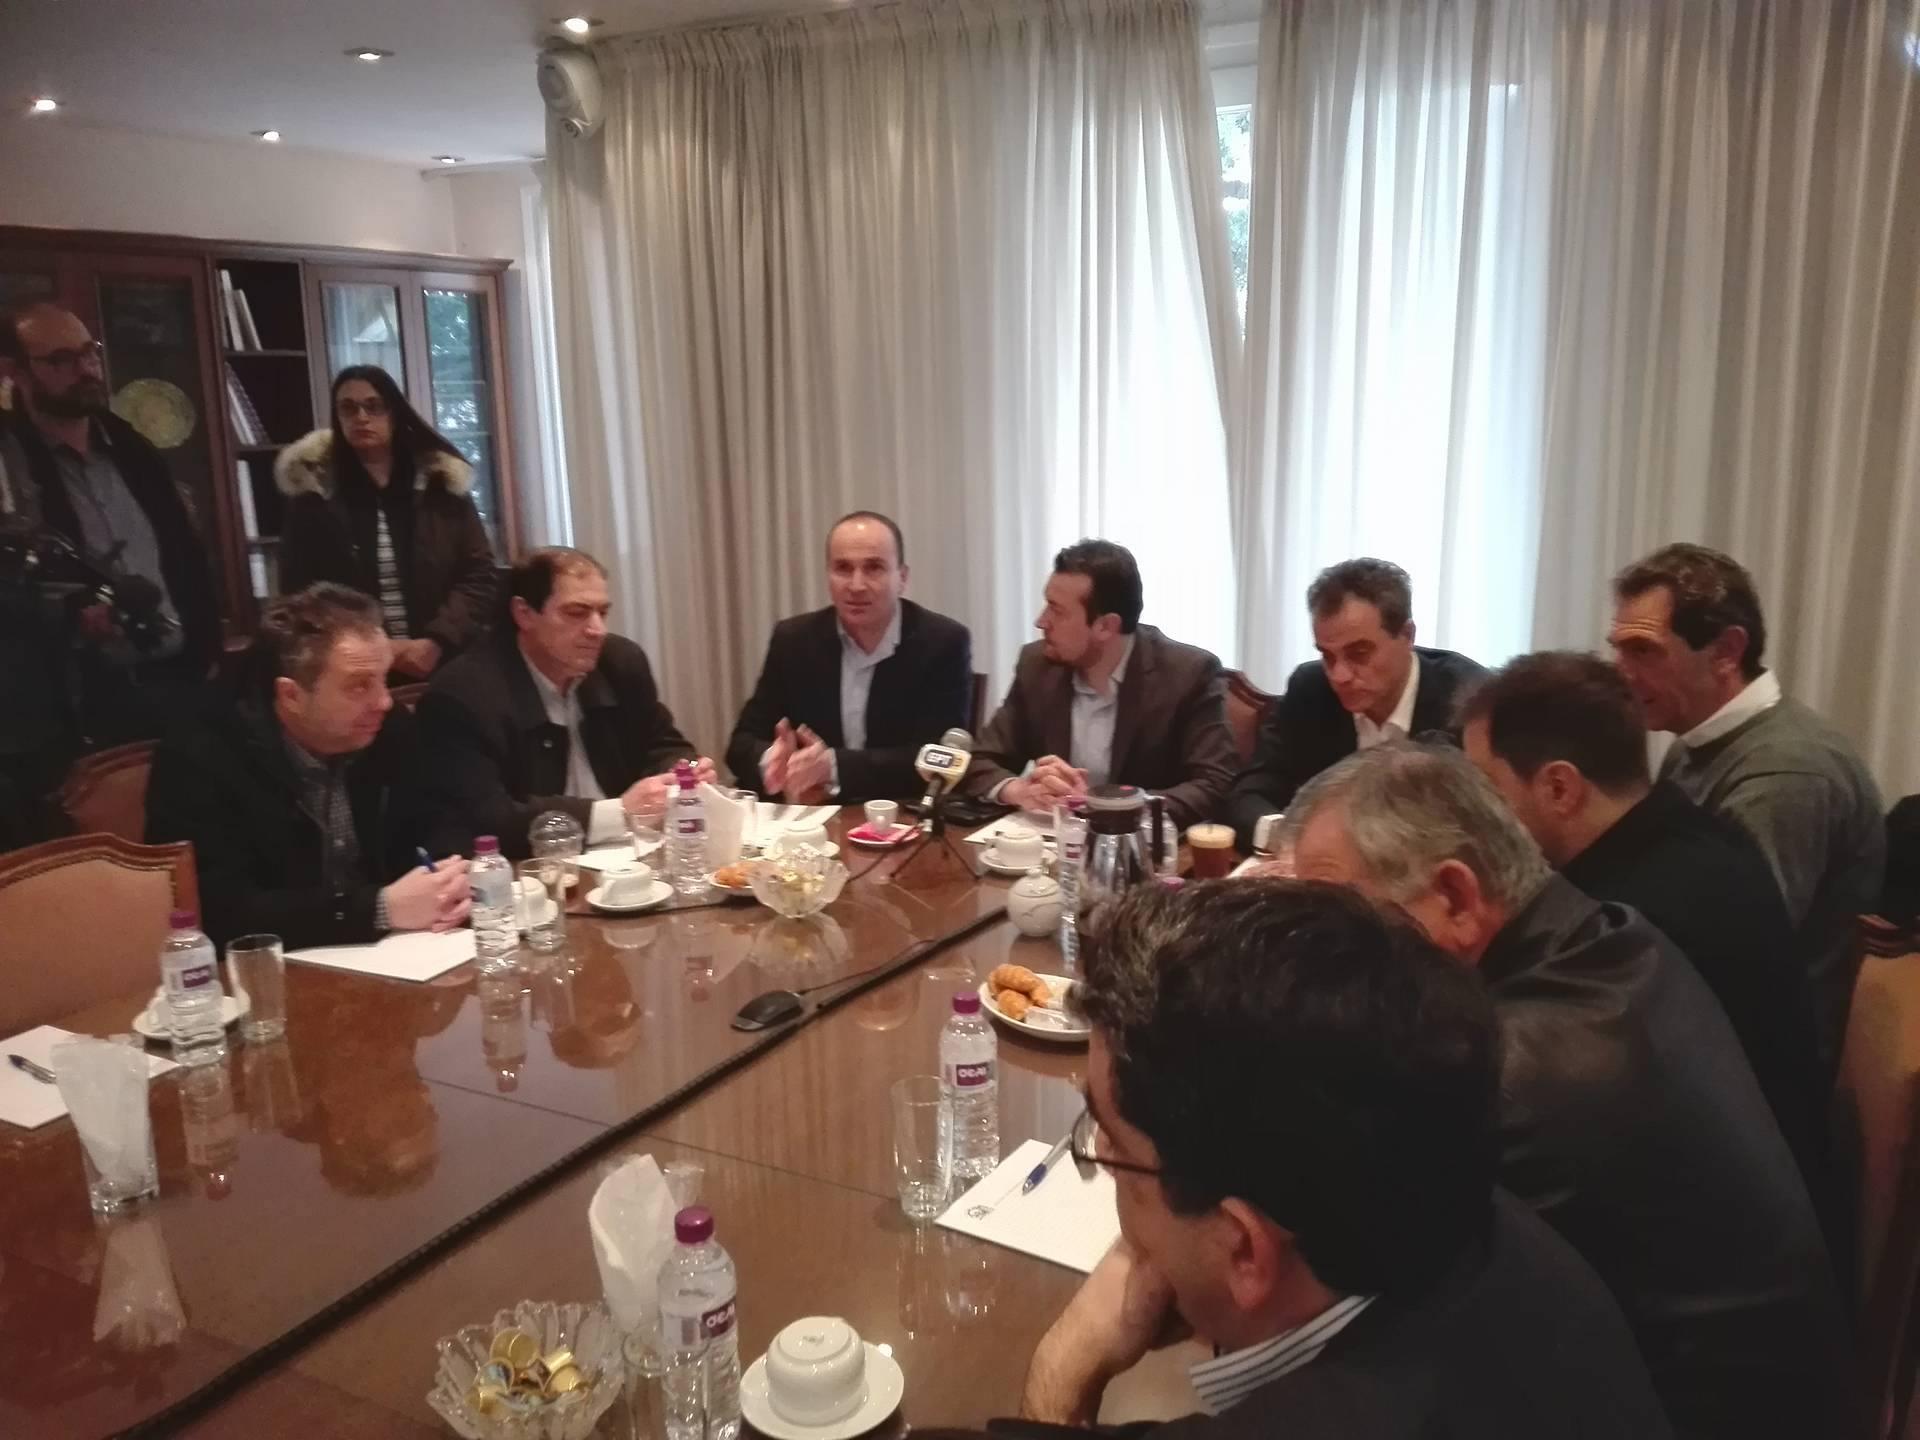 kozan.gr: Ώρα 11:00 π.μ.: Σύσκεψη με Παραγωγικούς Φορείς στην Αίθουσα Συνεδριάσεων του Επιμελητήριου Κοζάνης πραγματοποίησε ο Υπουργός Νίκος Παππάς (Bίντεο & Φωτογραφίες)